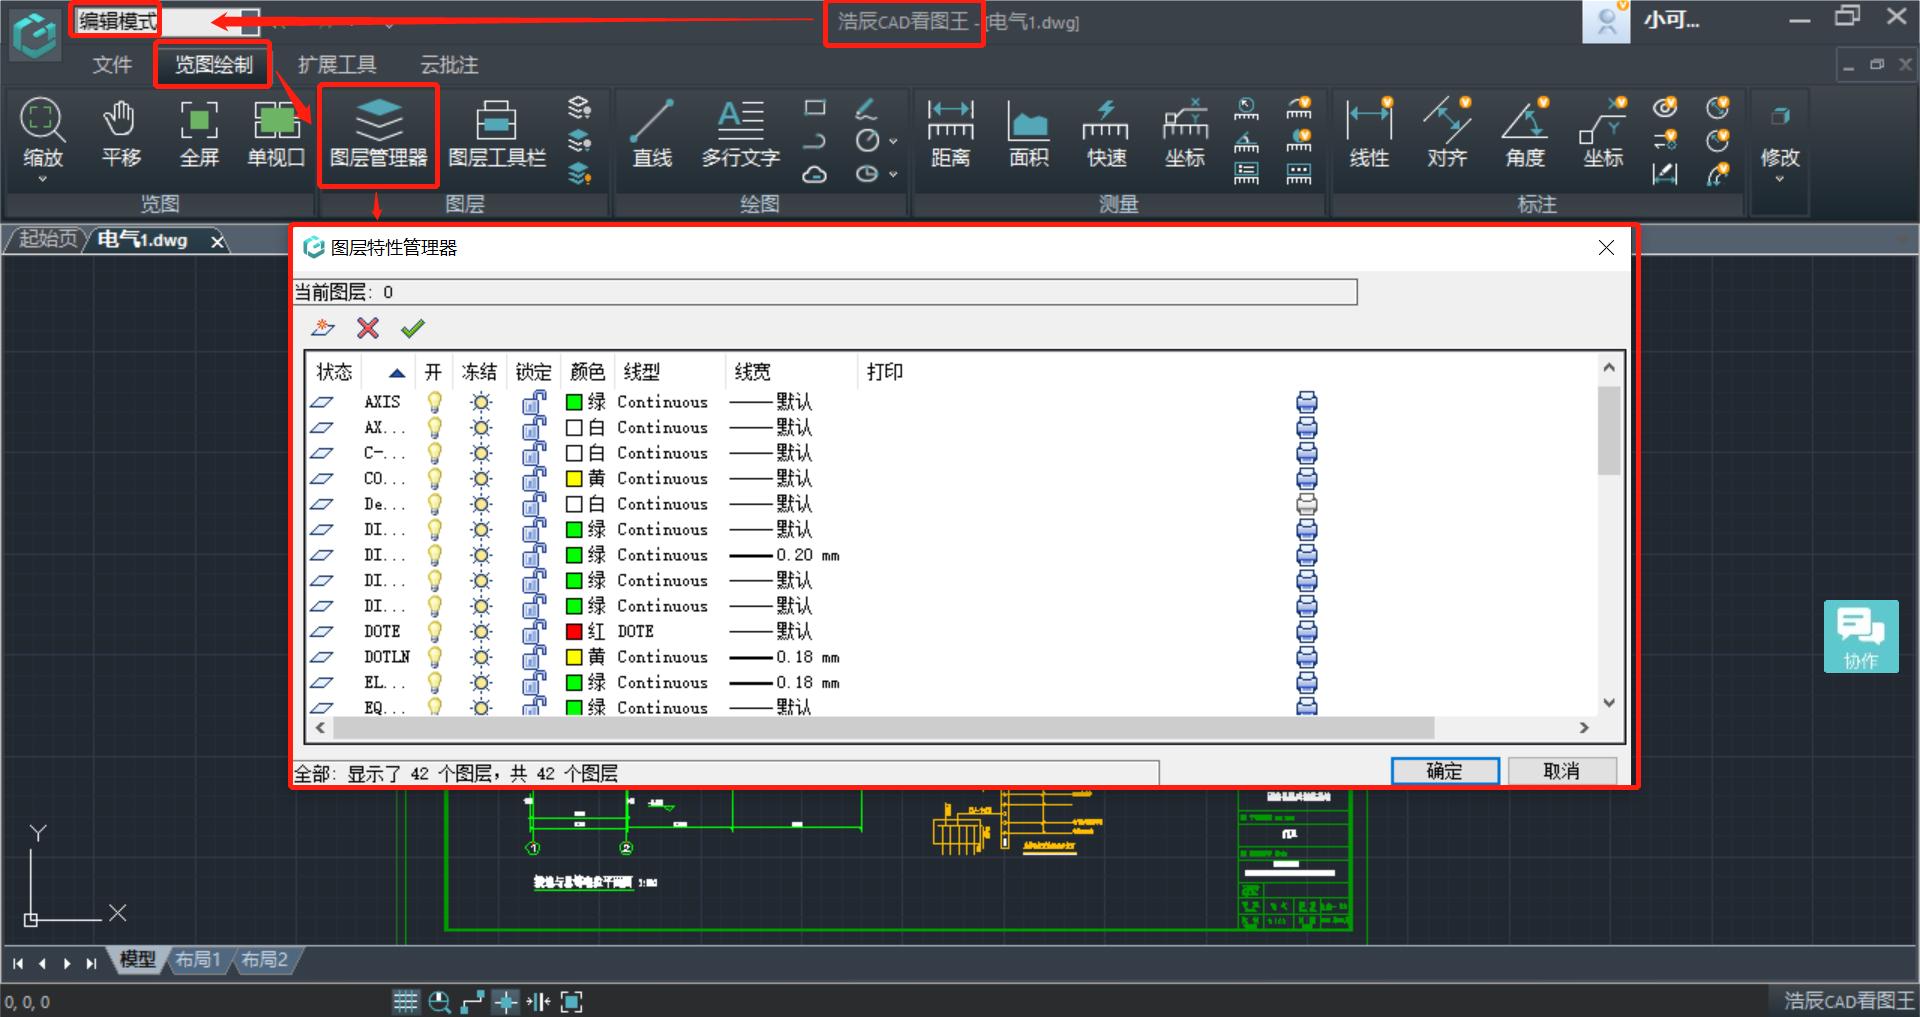 CAD看图软件能画图吗?浩辰CAD看图王应用技巧